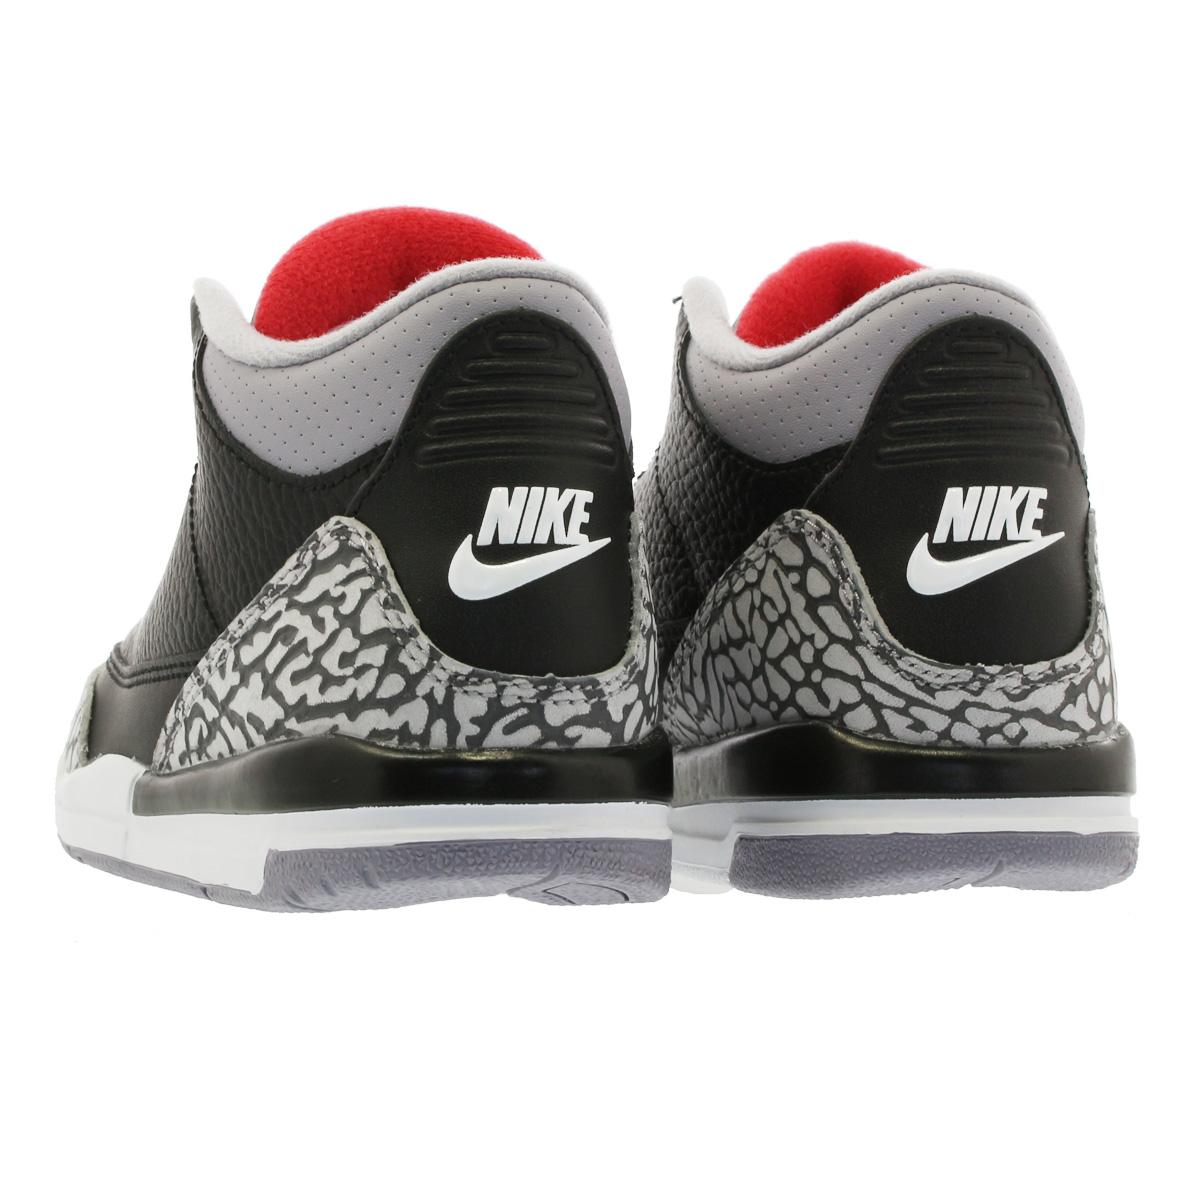 377be83fdcd ... NIKE AIR JORDAN 3 RETRO BP Nike Air Jordan 3 nostalgic BP BLACK/FIRE RED  ...